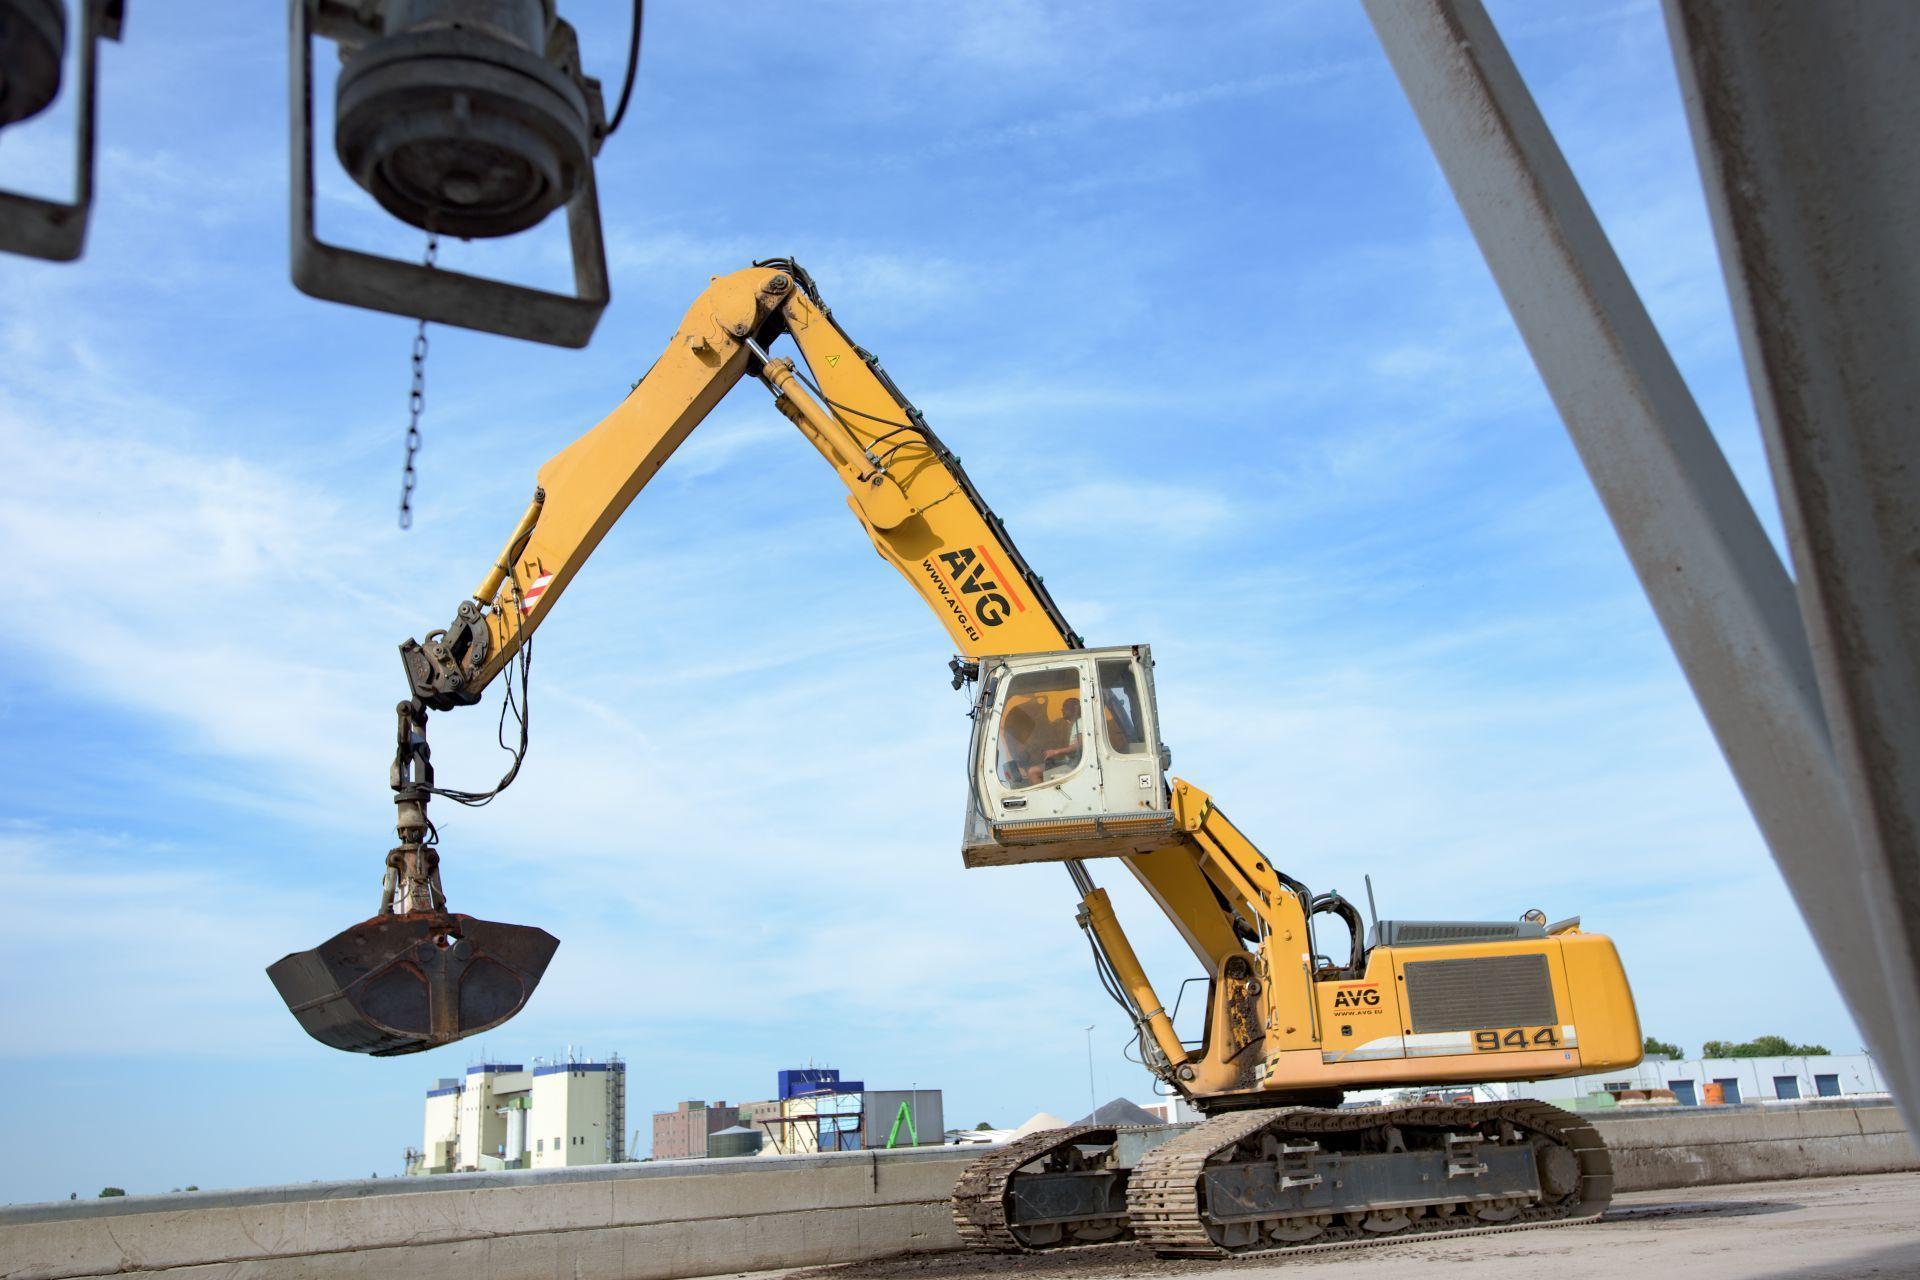 kraan-schip-laden-lossen-avg-bouwstoffen-recycling